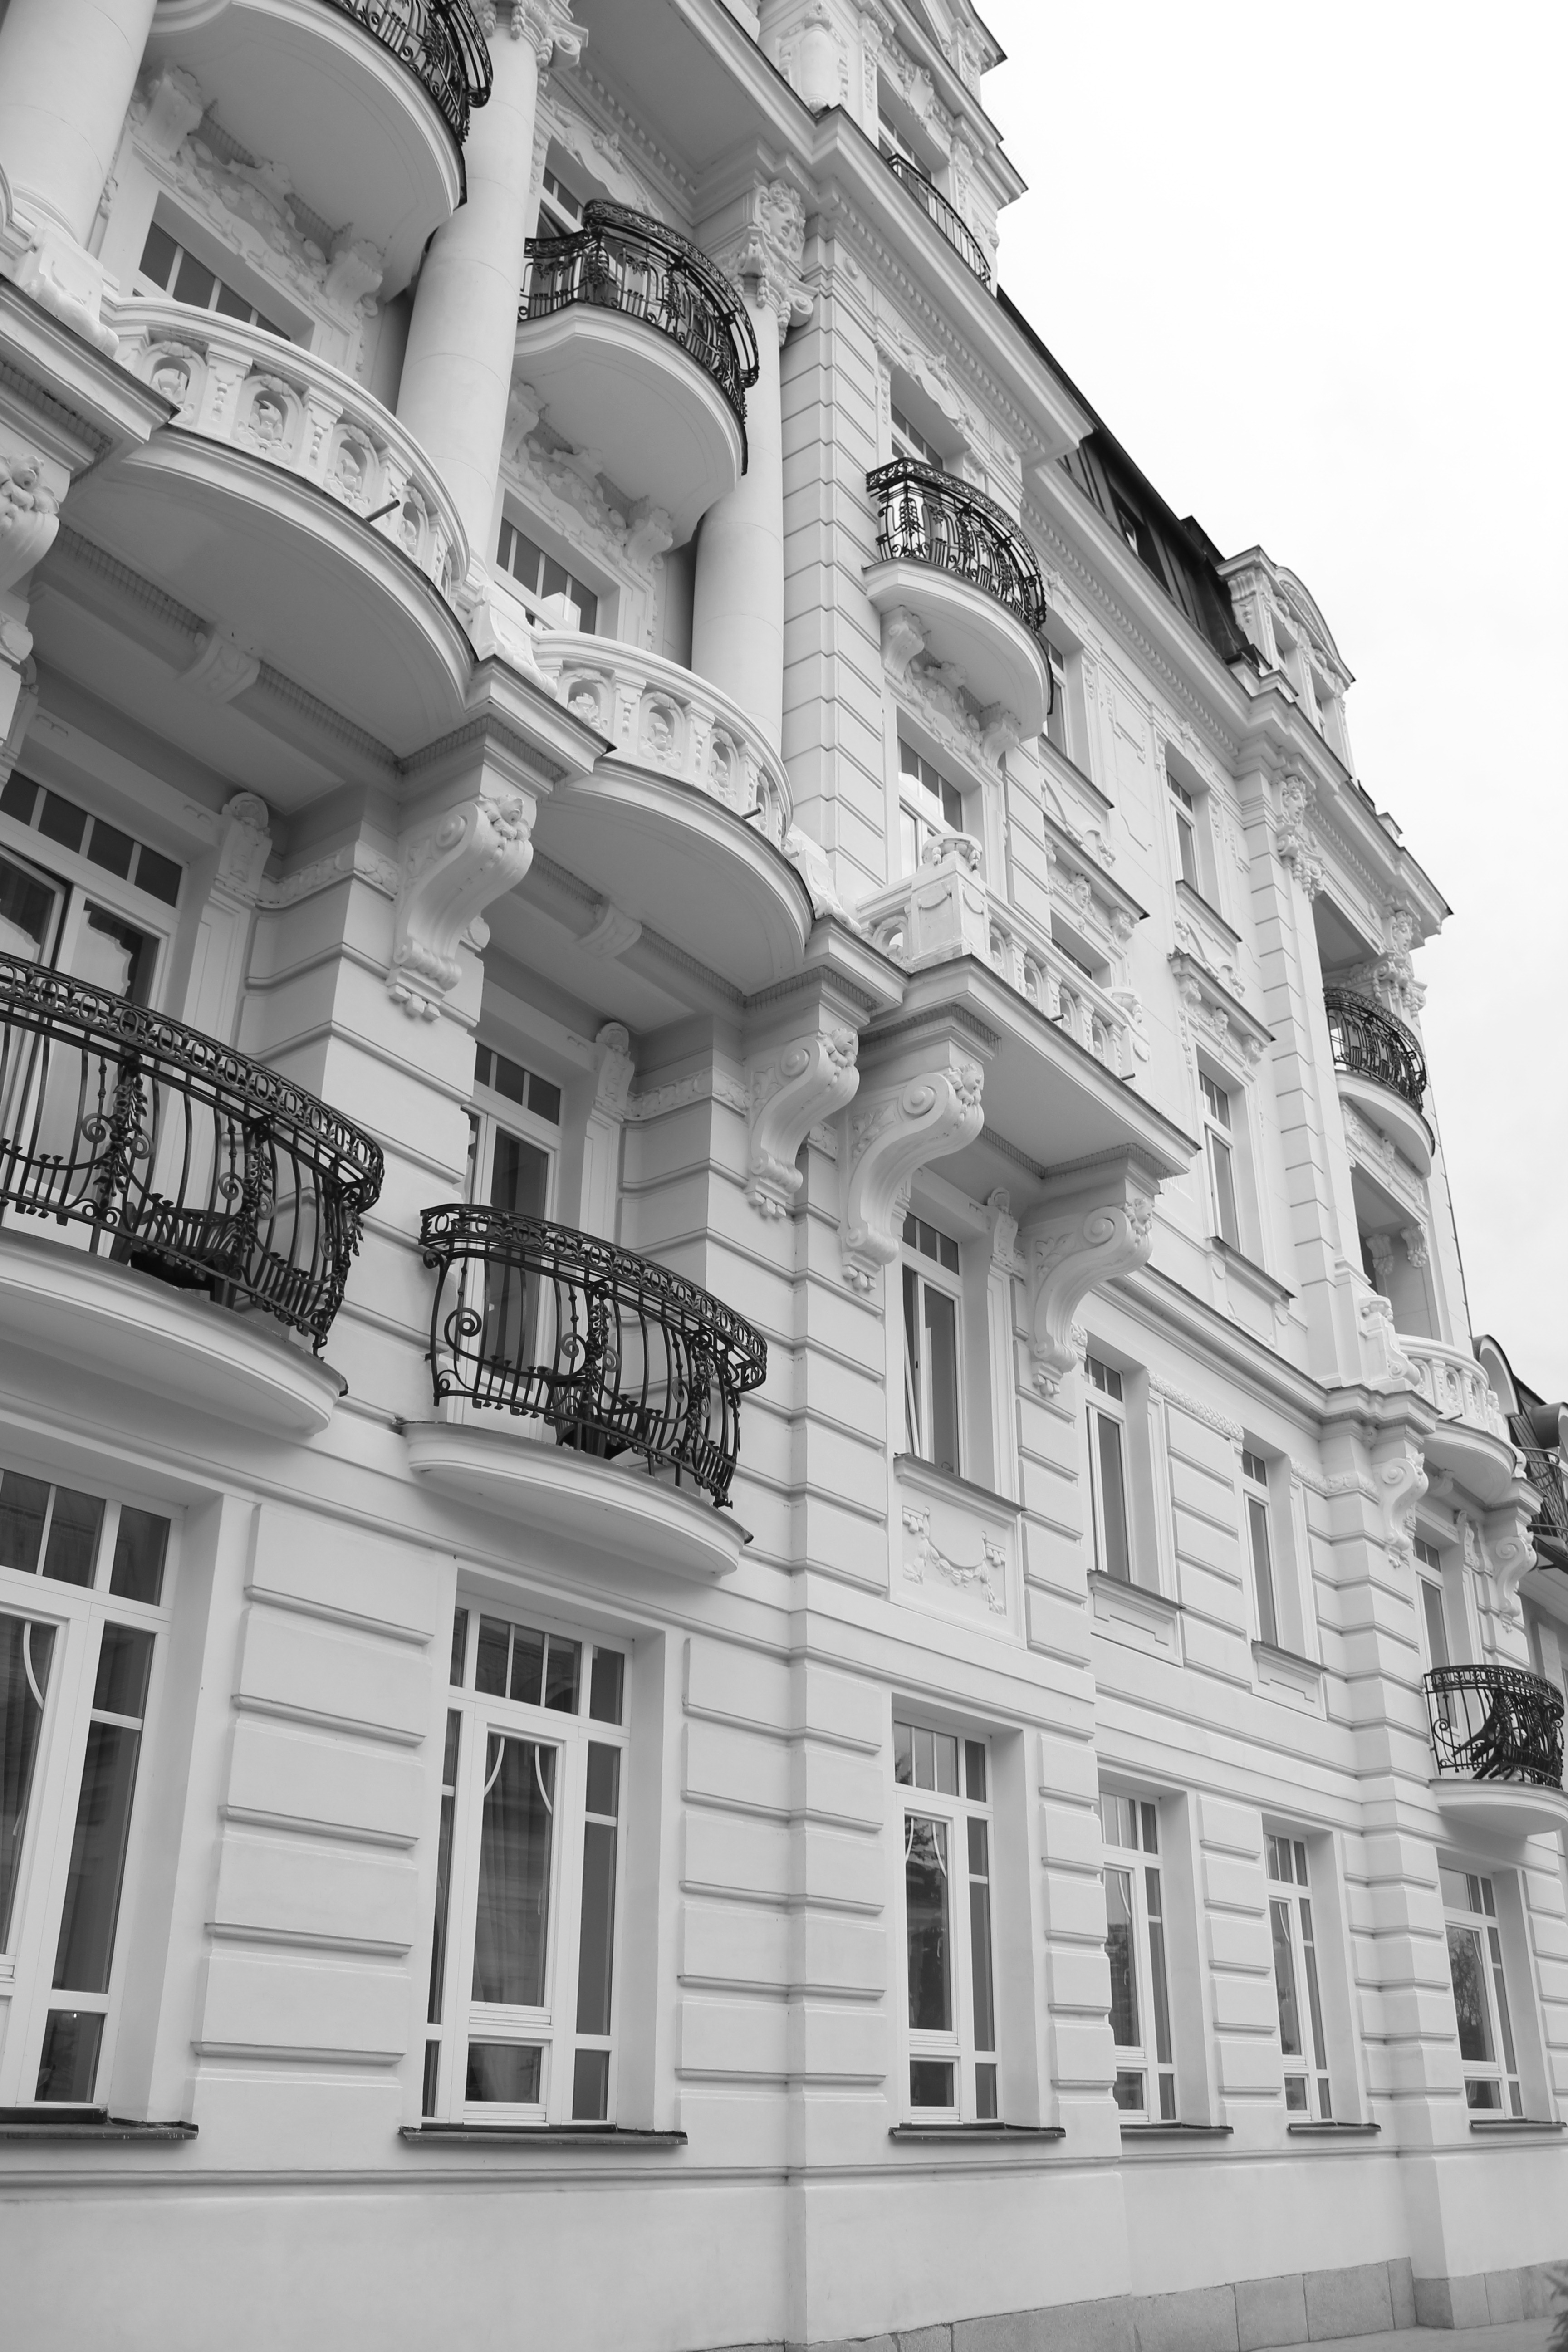 Kurhaus Kijev – Franzensbad